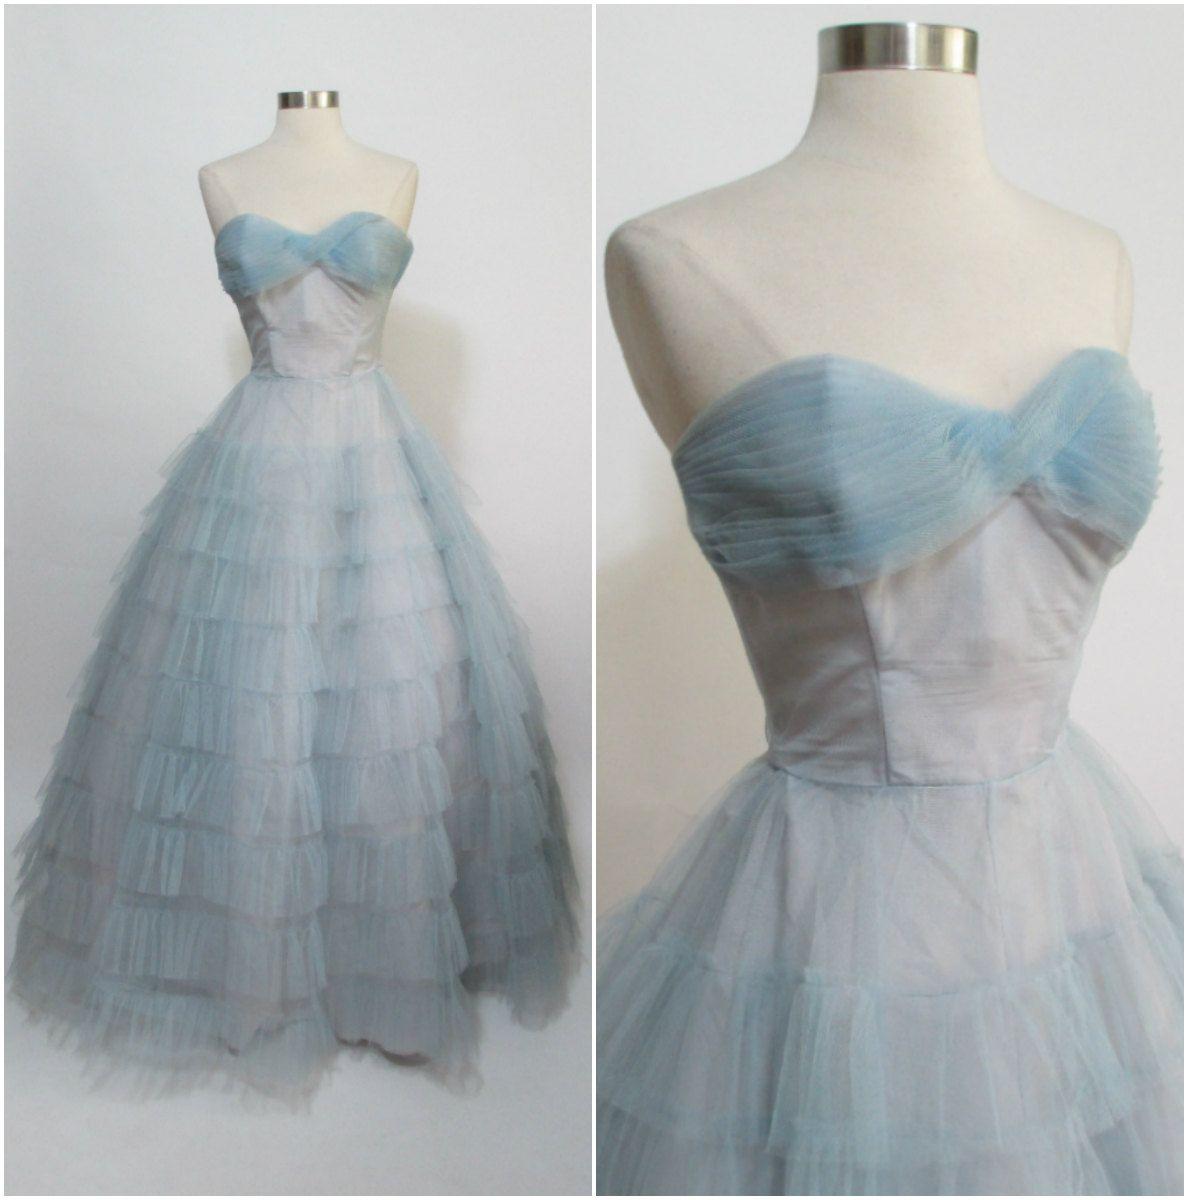 1950s Vintage Powder Blue Floor Length Layered Tulle Prom Dress Xs 24 Waist Vintage Style Dresses Layered Tulle Prom Dress Vintage Dresses [ 1200 x 1188 Pixel ]